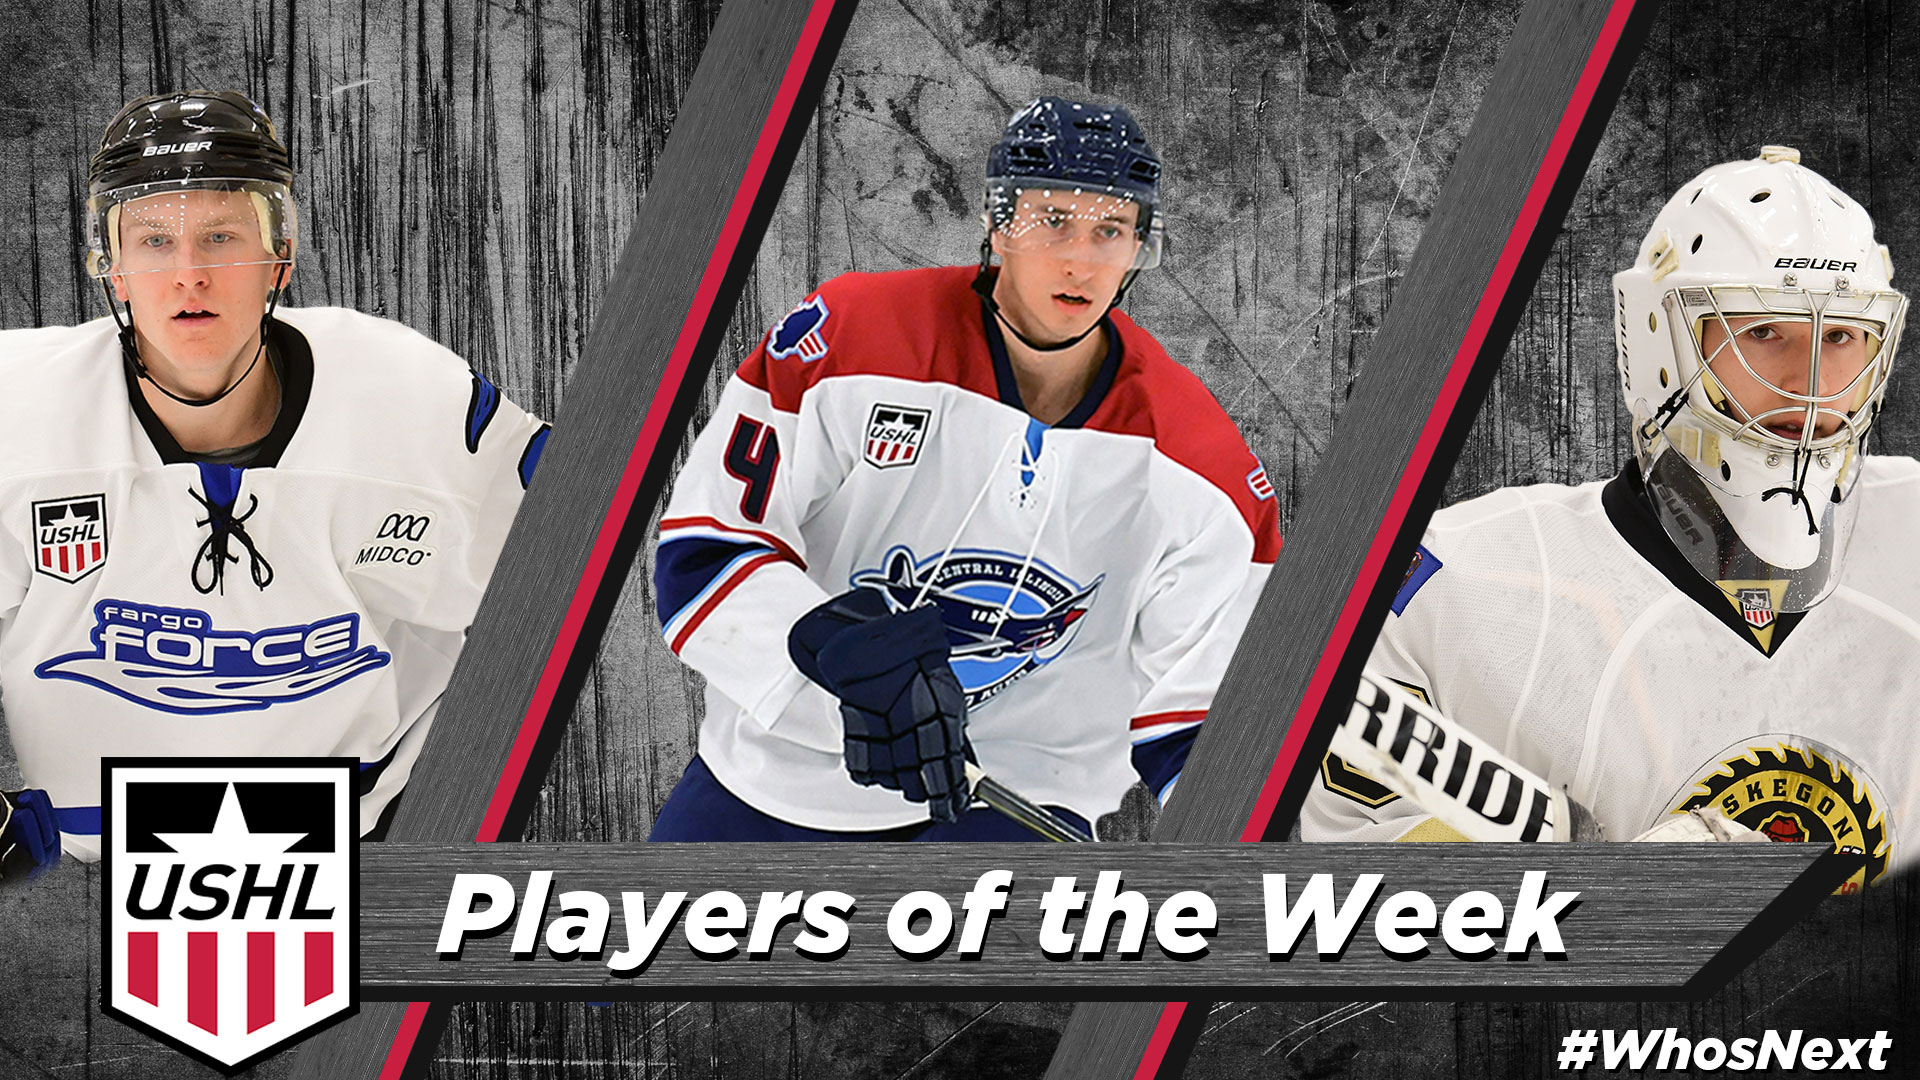 USHL: Players Of The Week - Week 2, 2018-19